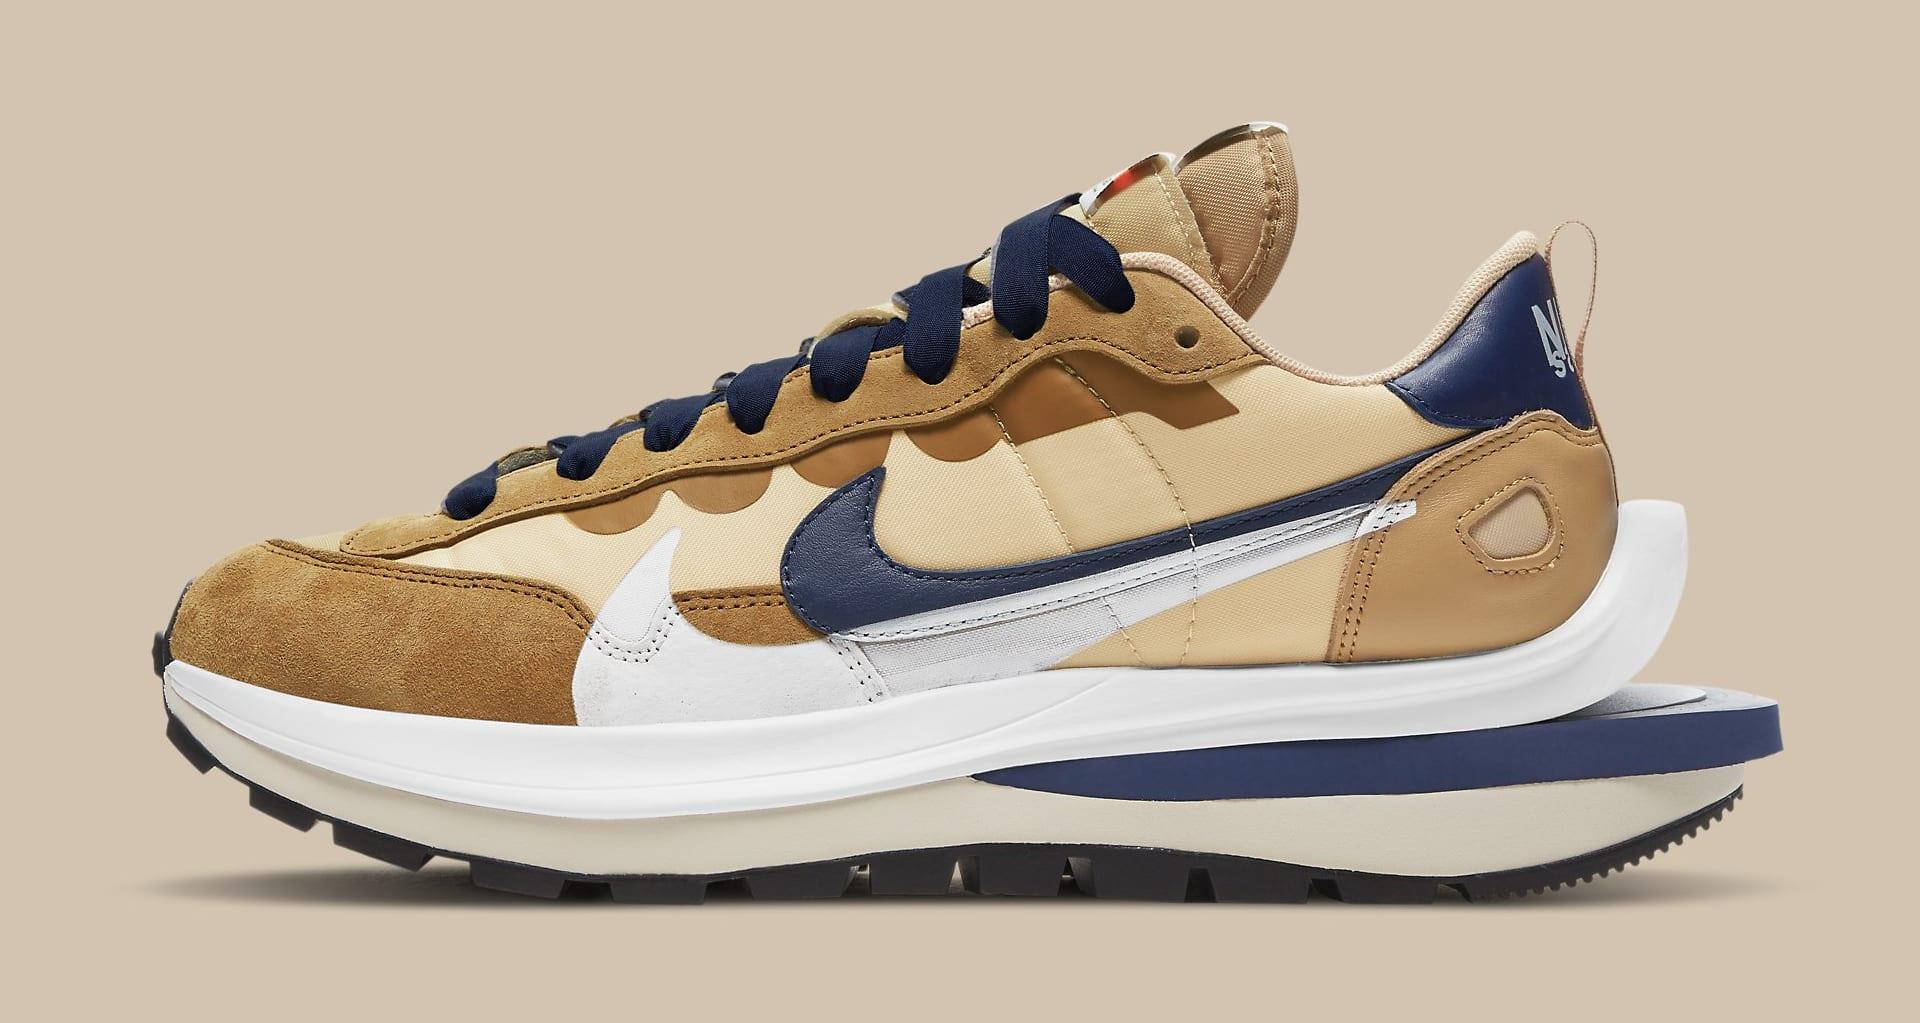 Sacai x Nike VaporWaffle 'Sesame/Blue Void' DD1875-200 Lateral